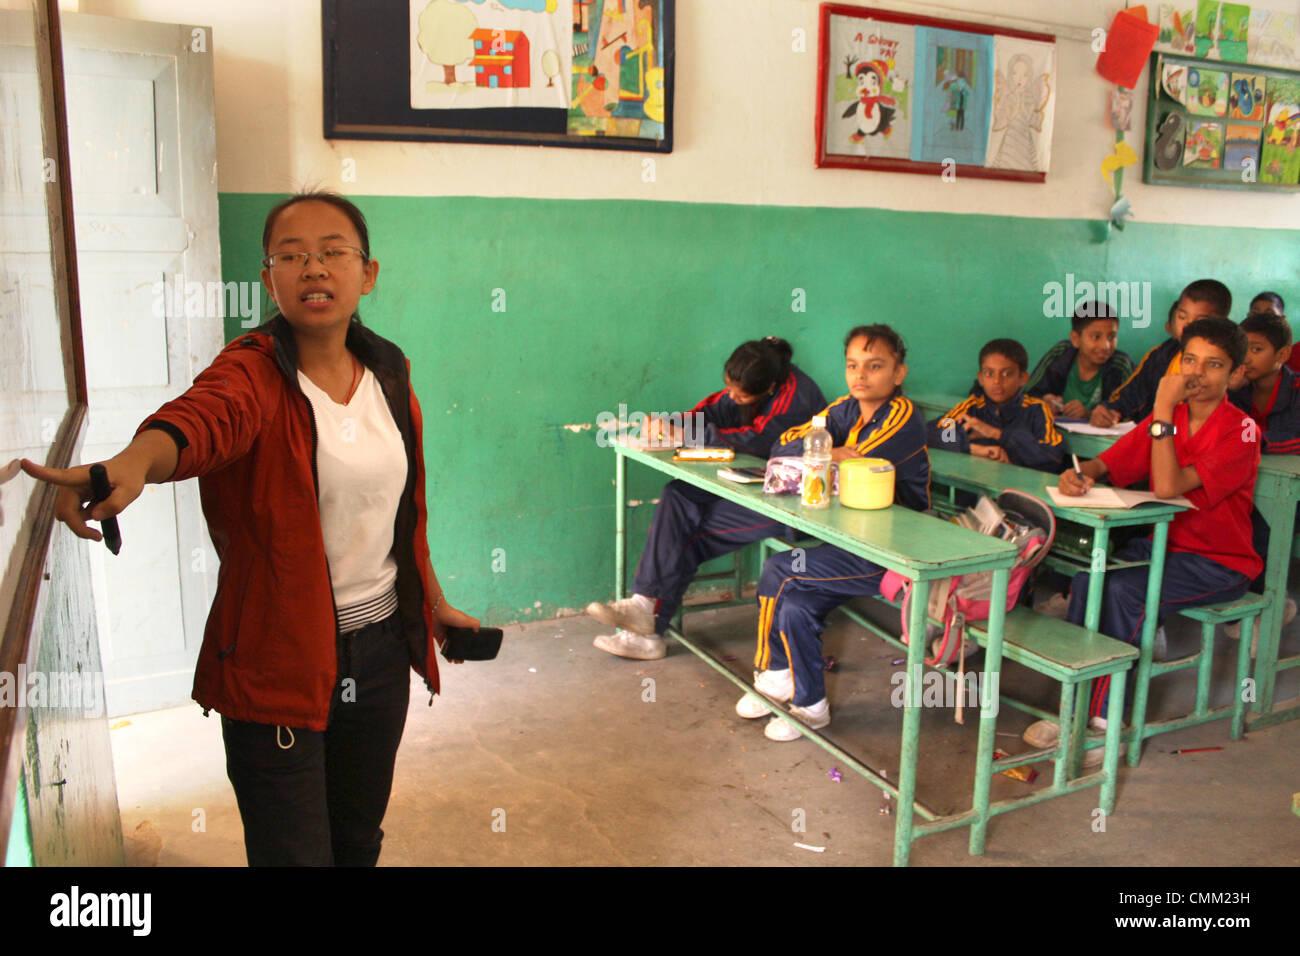 Wu Lijuan aus China lehrt siebten Klasse an der englischen Preparatory School (EPS) in Kathmandu in Nepal, 25. Oktober Stockbild